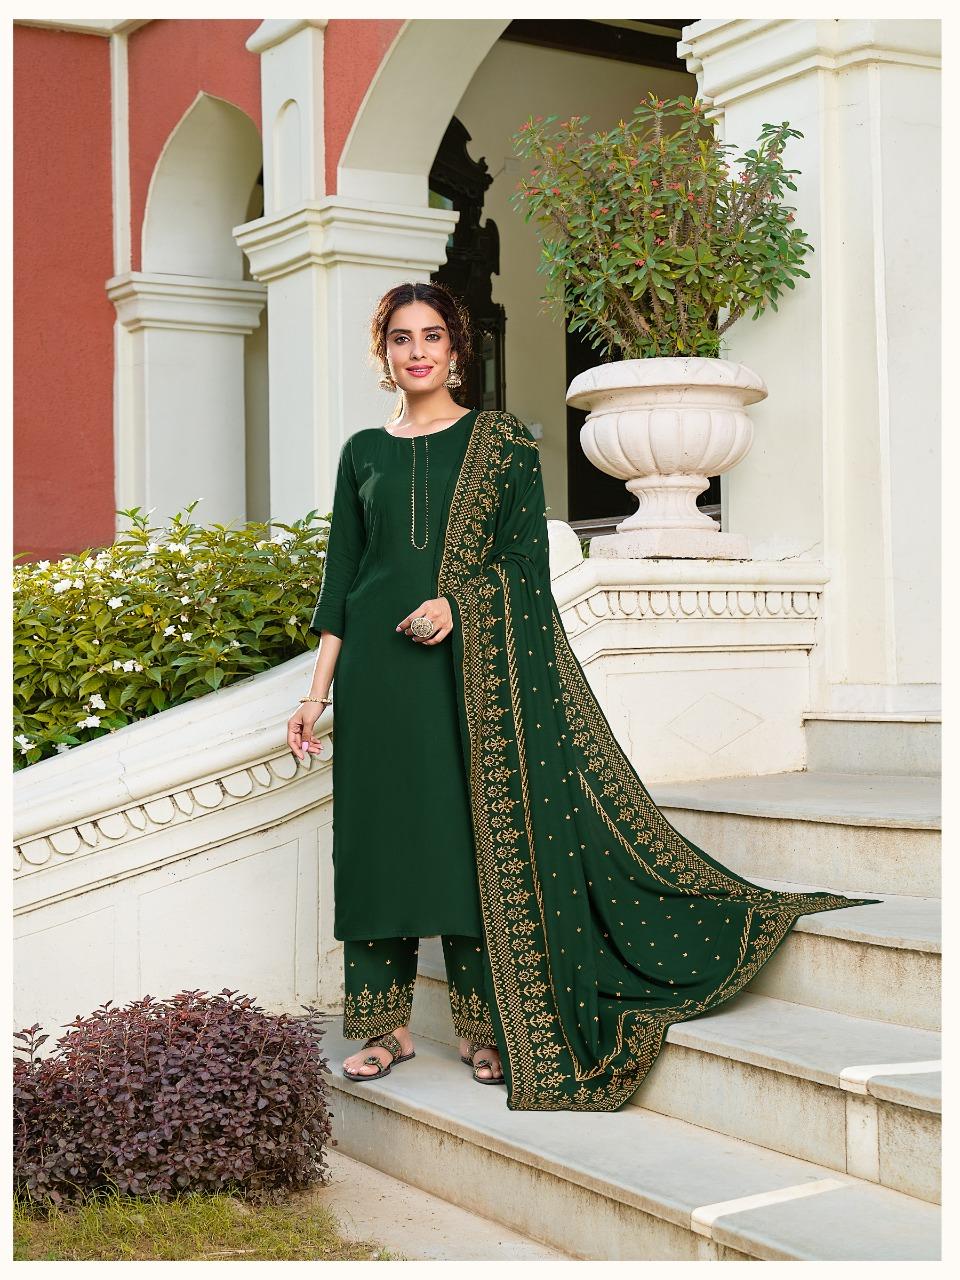 Banwery Panghat Wholesale Full Stitched 3 piece Salwar Kameez